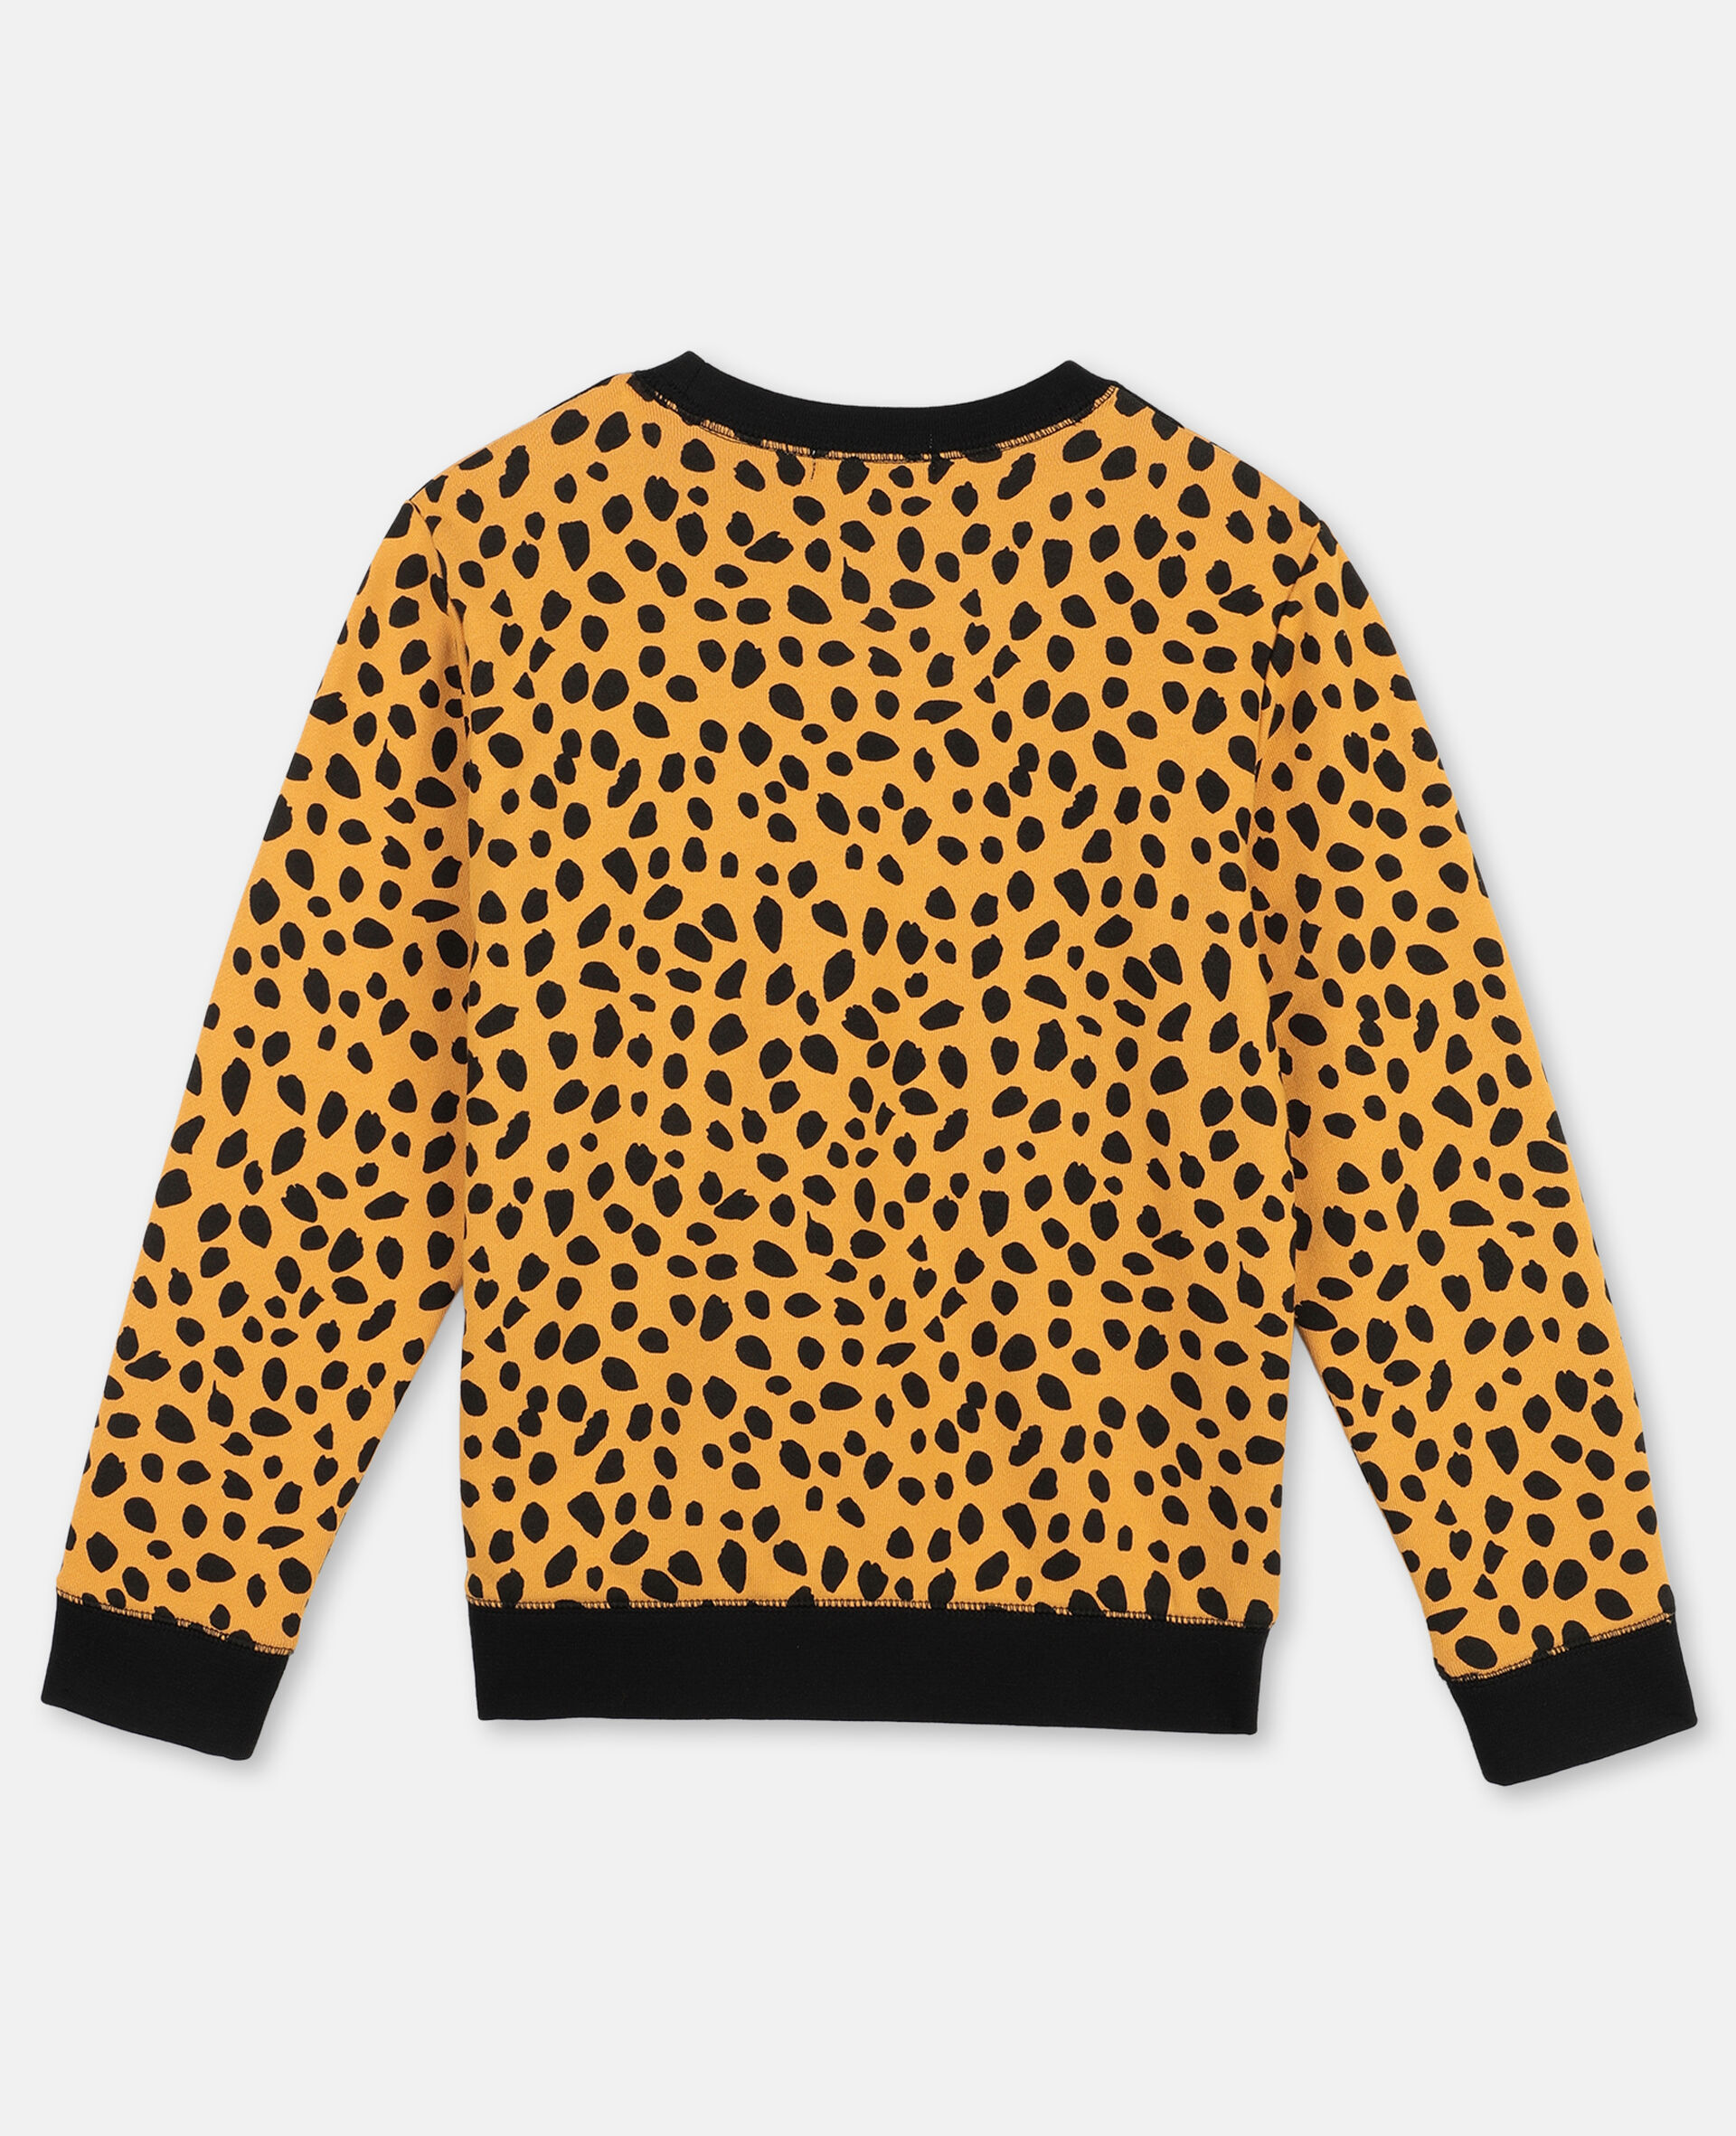 Cheetah Dots Cotton Fleece Sweatshirt -Multicolour-large image number 3